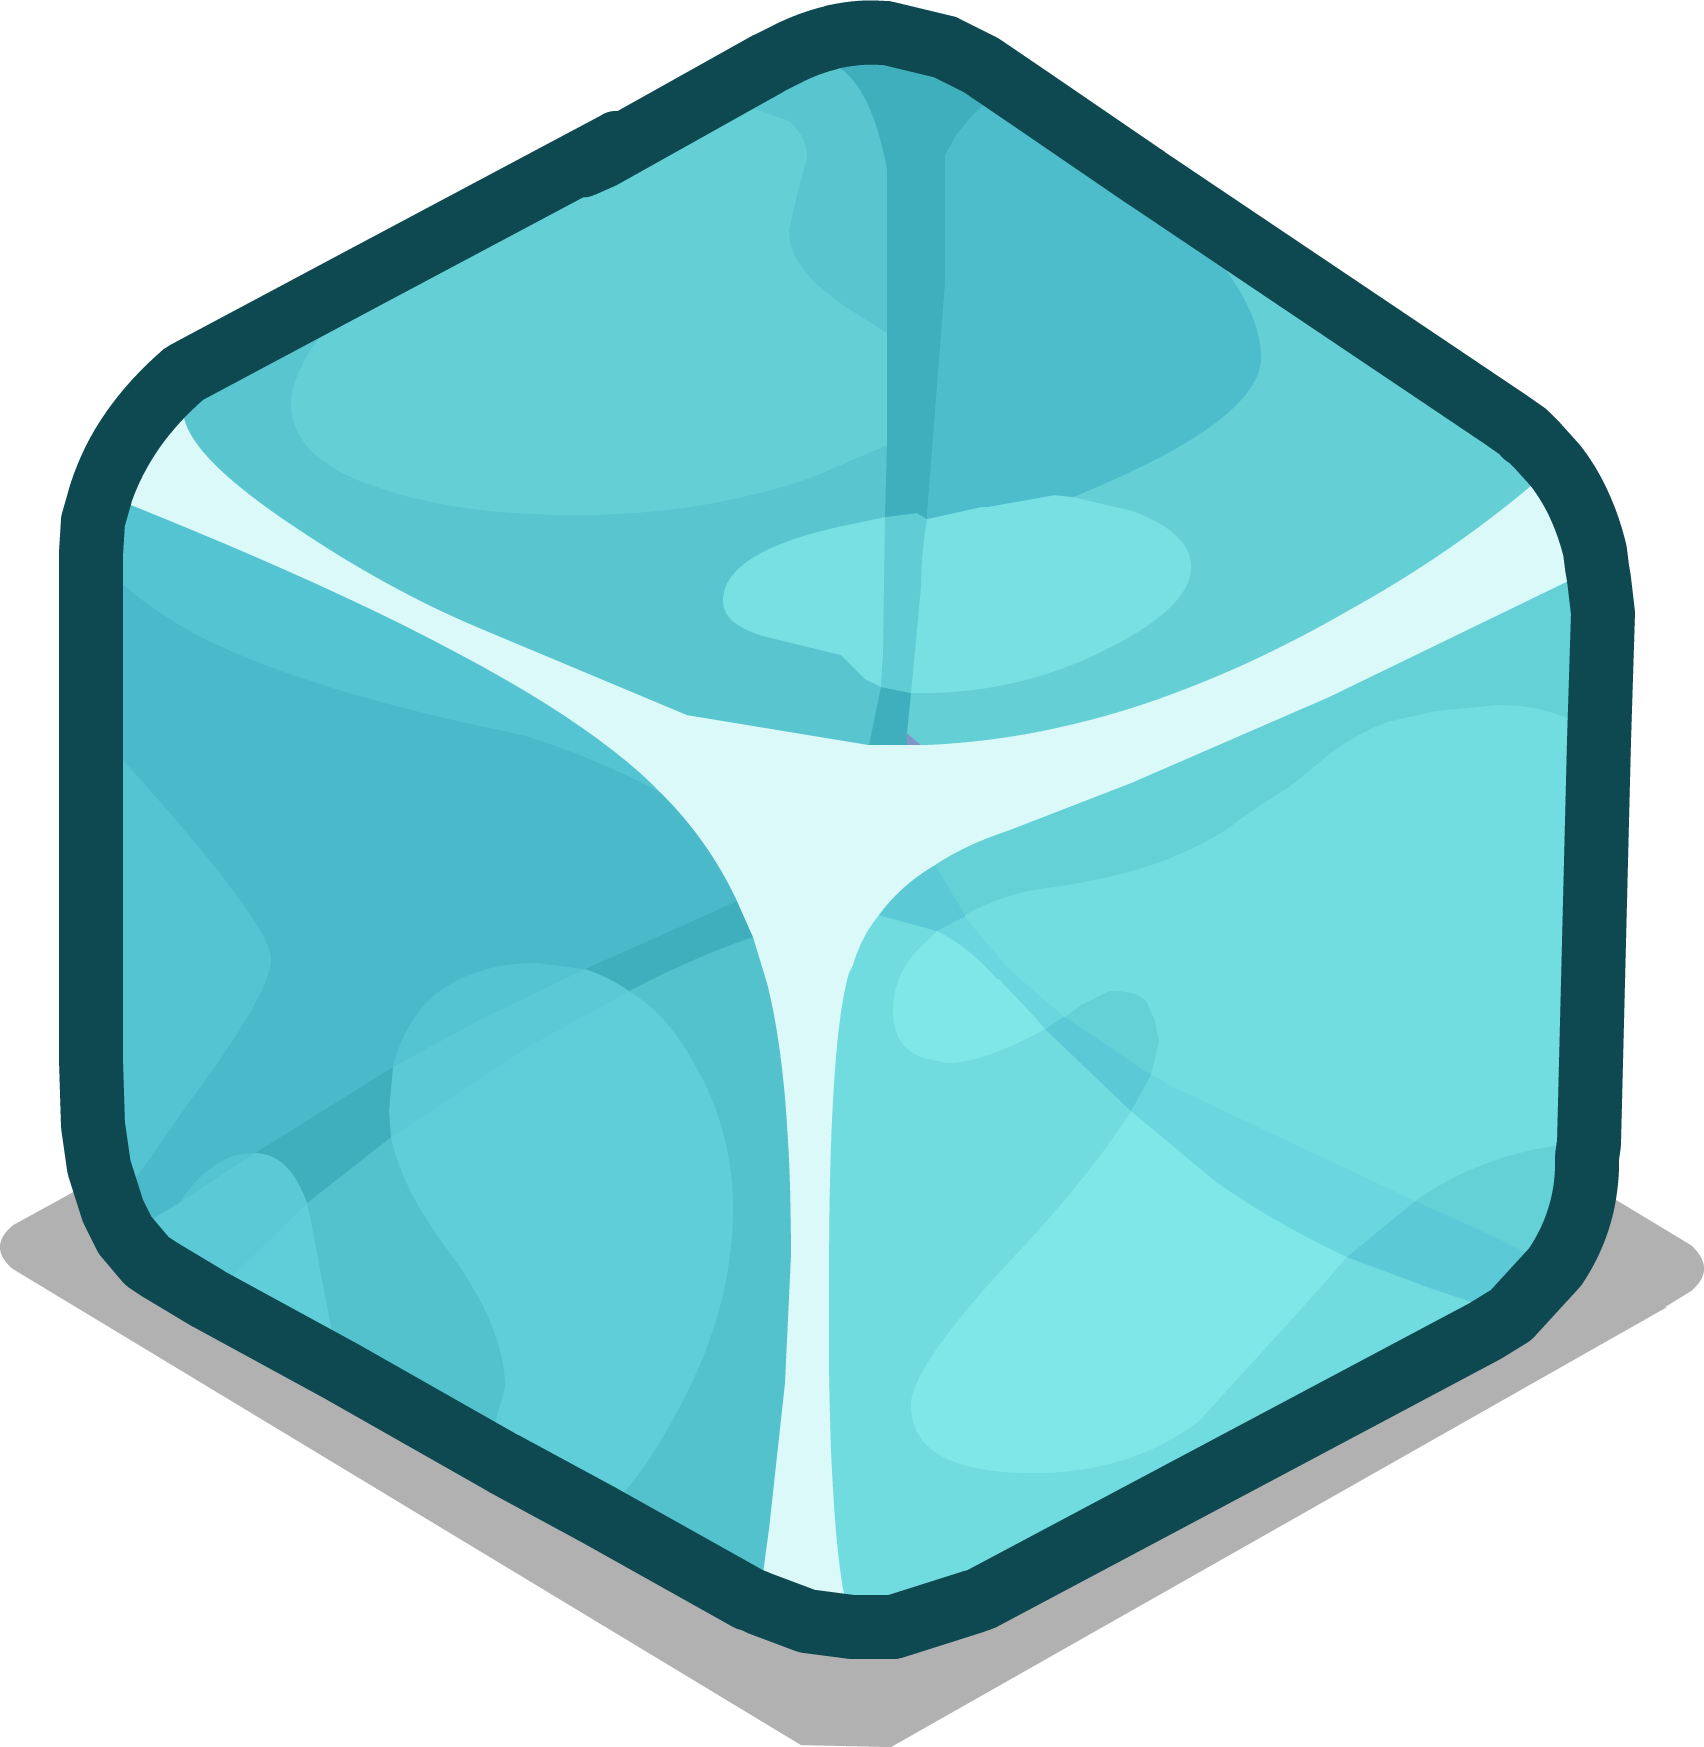 Sun melting ice clipart vector library download Ice PNG, ice cube PNG images free download vector library download